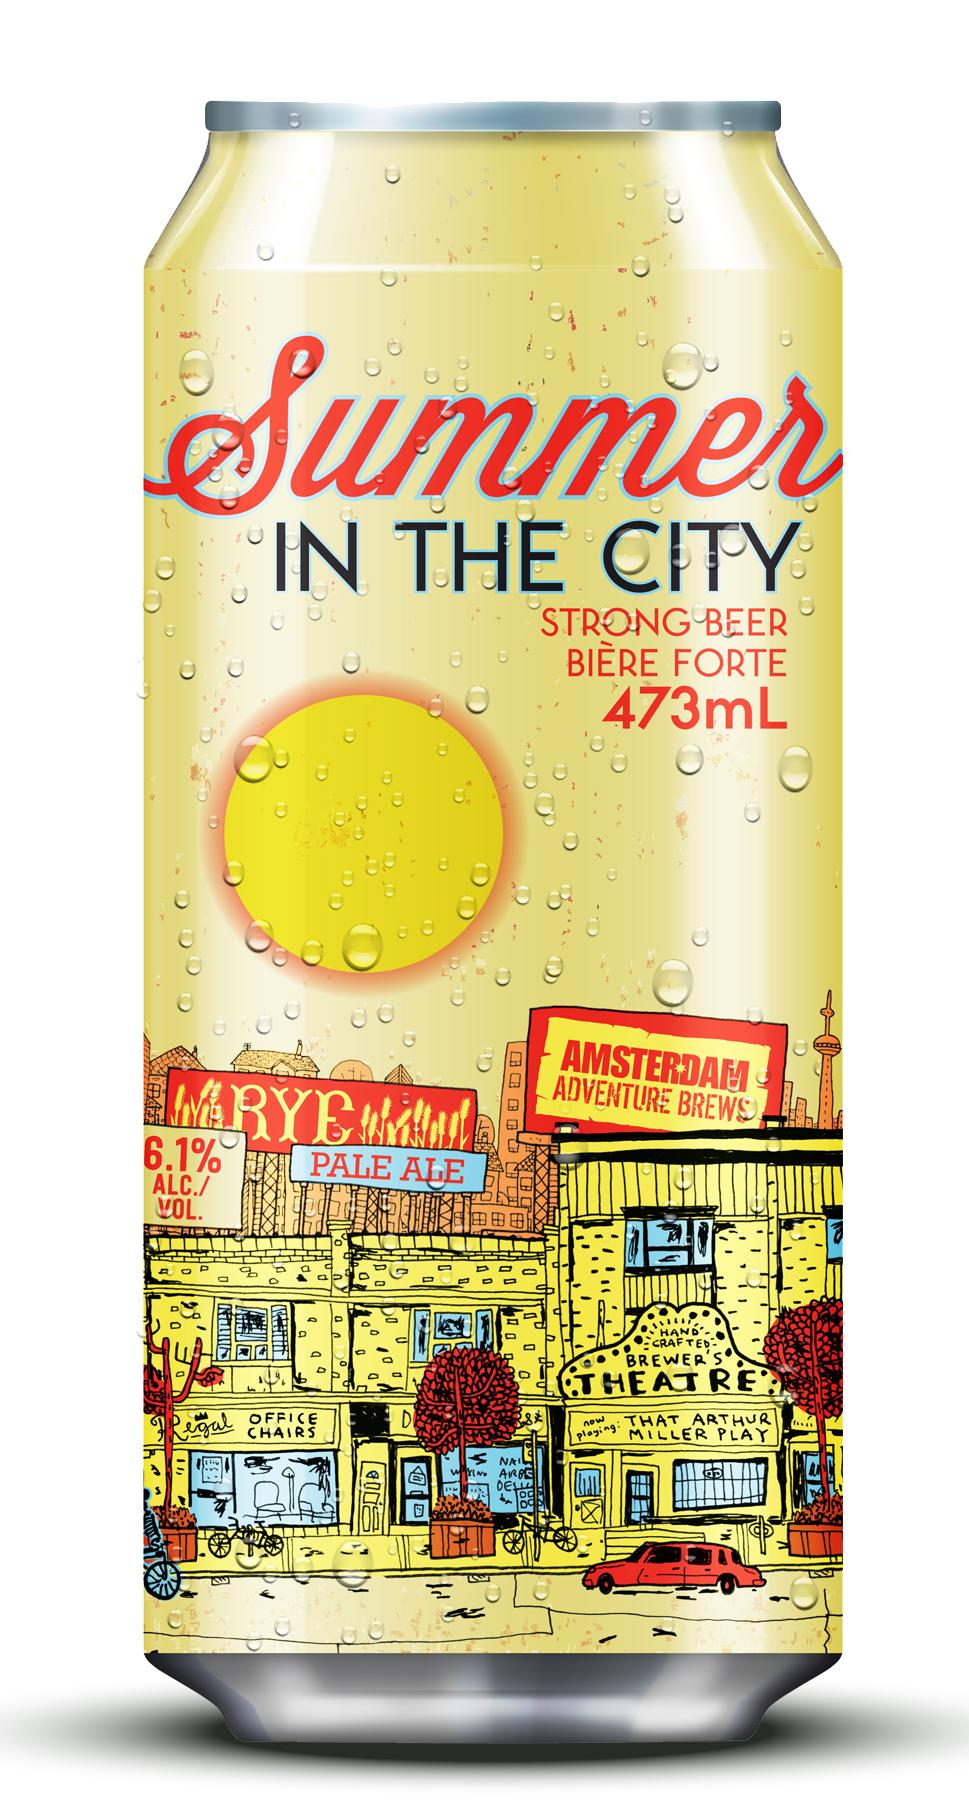 Adbrew17 - Summer in the City.jpg